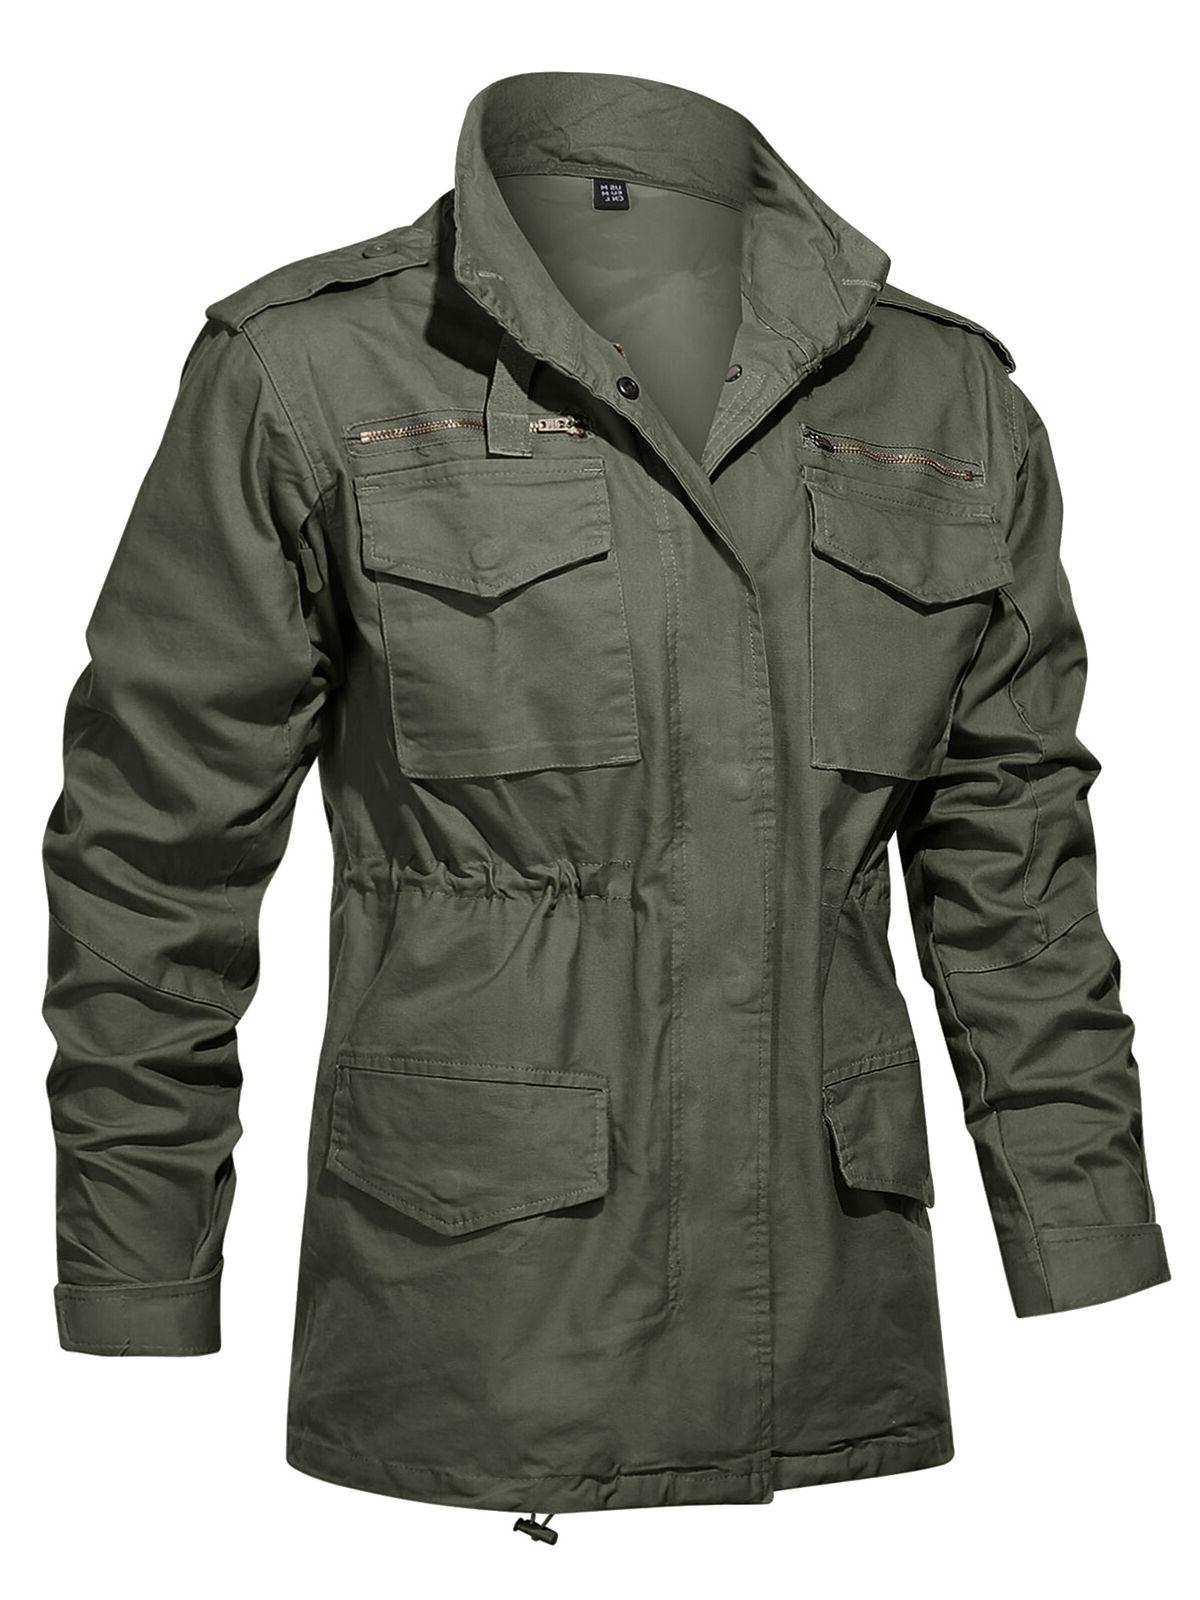 Military 65 Field Men's Tactical Windbreaker Clothes